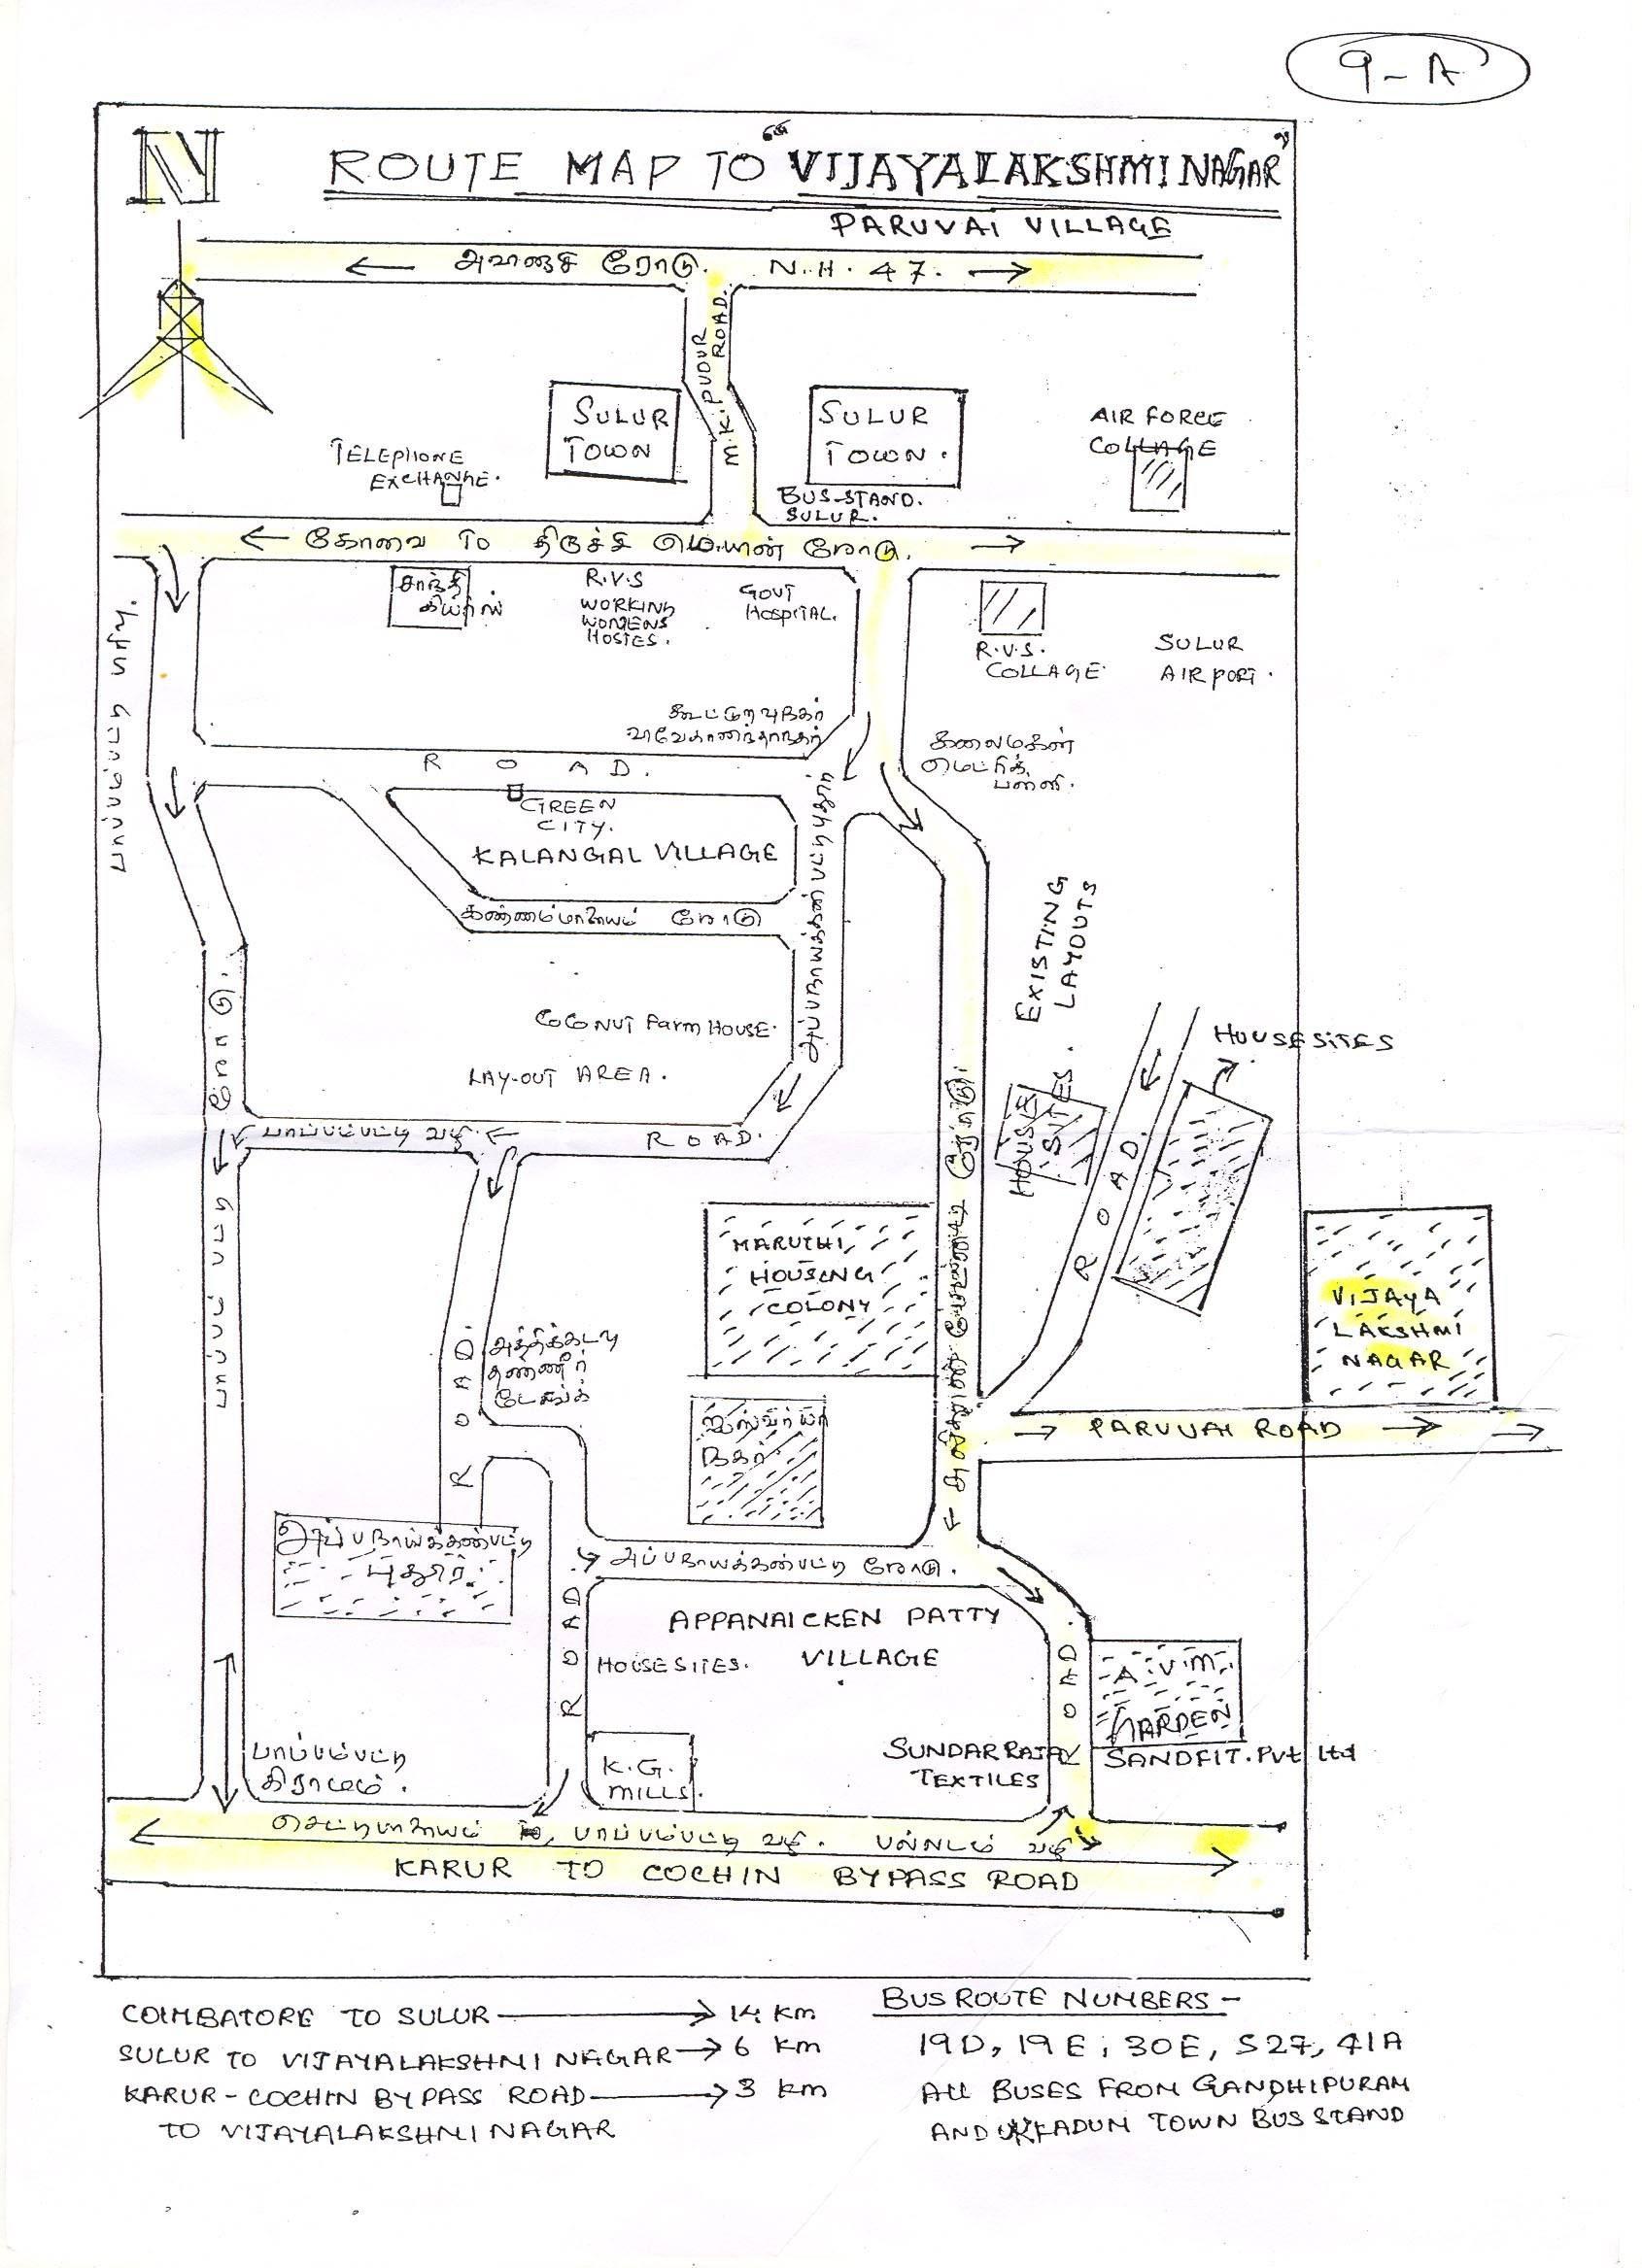 Coimbatore Route Map vijayalakshminagar   lakmirster